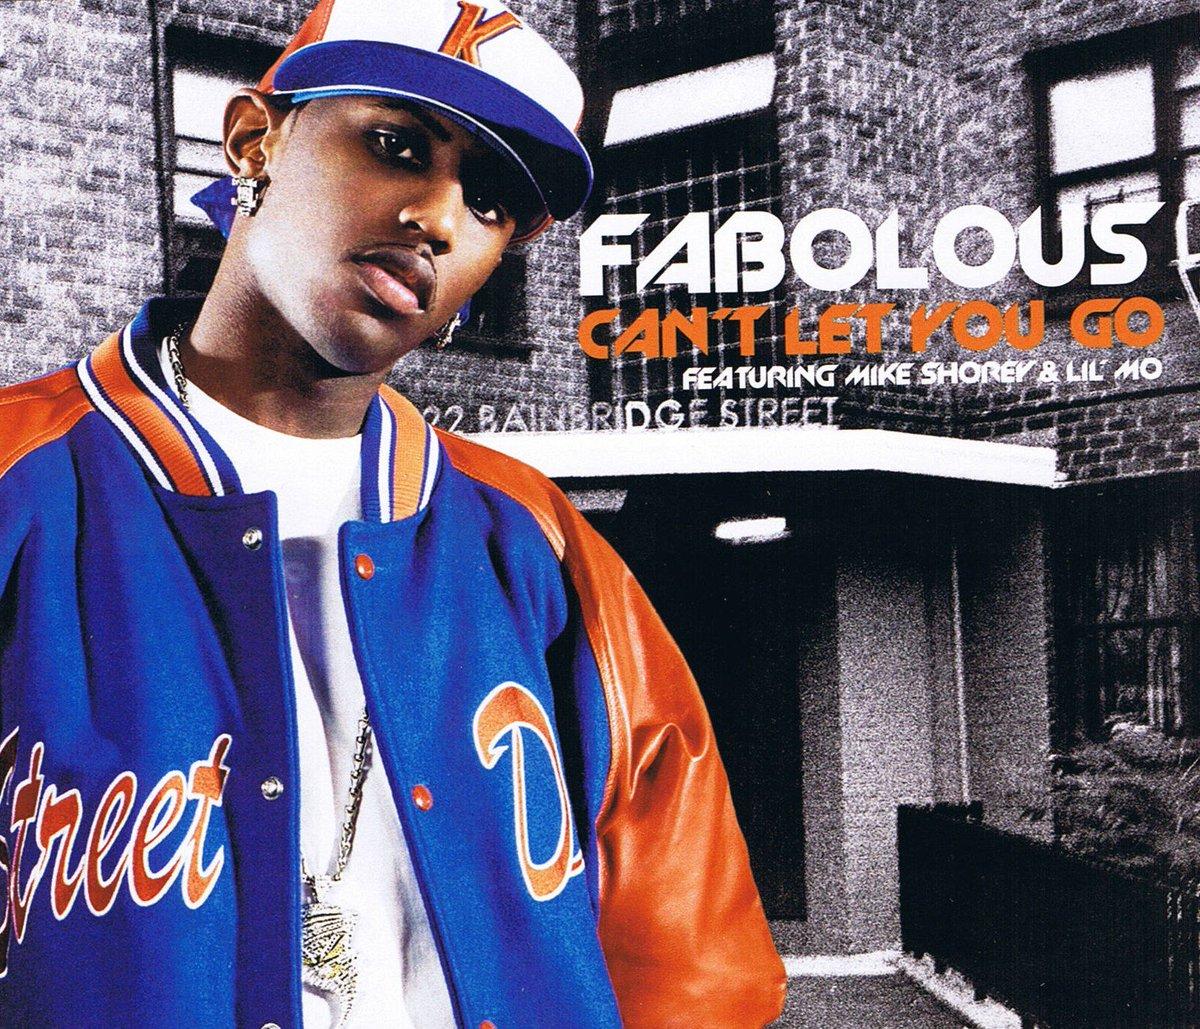 #UpNext Can't Let You Go - Fabolous ft. Lil Mo https://t.co/CFNEw2B4FI Listen Now! https://t.co/dGWEc2mYiB